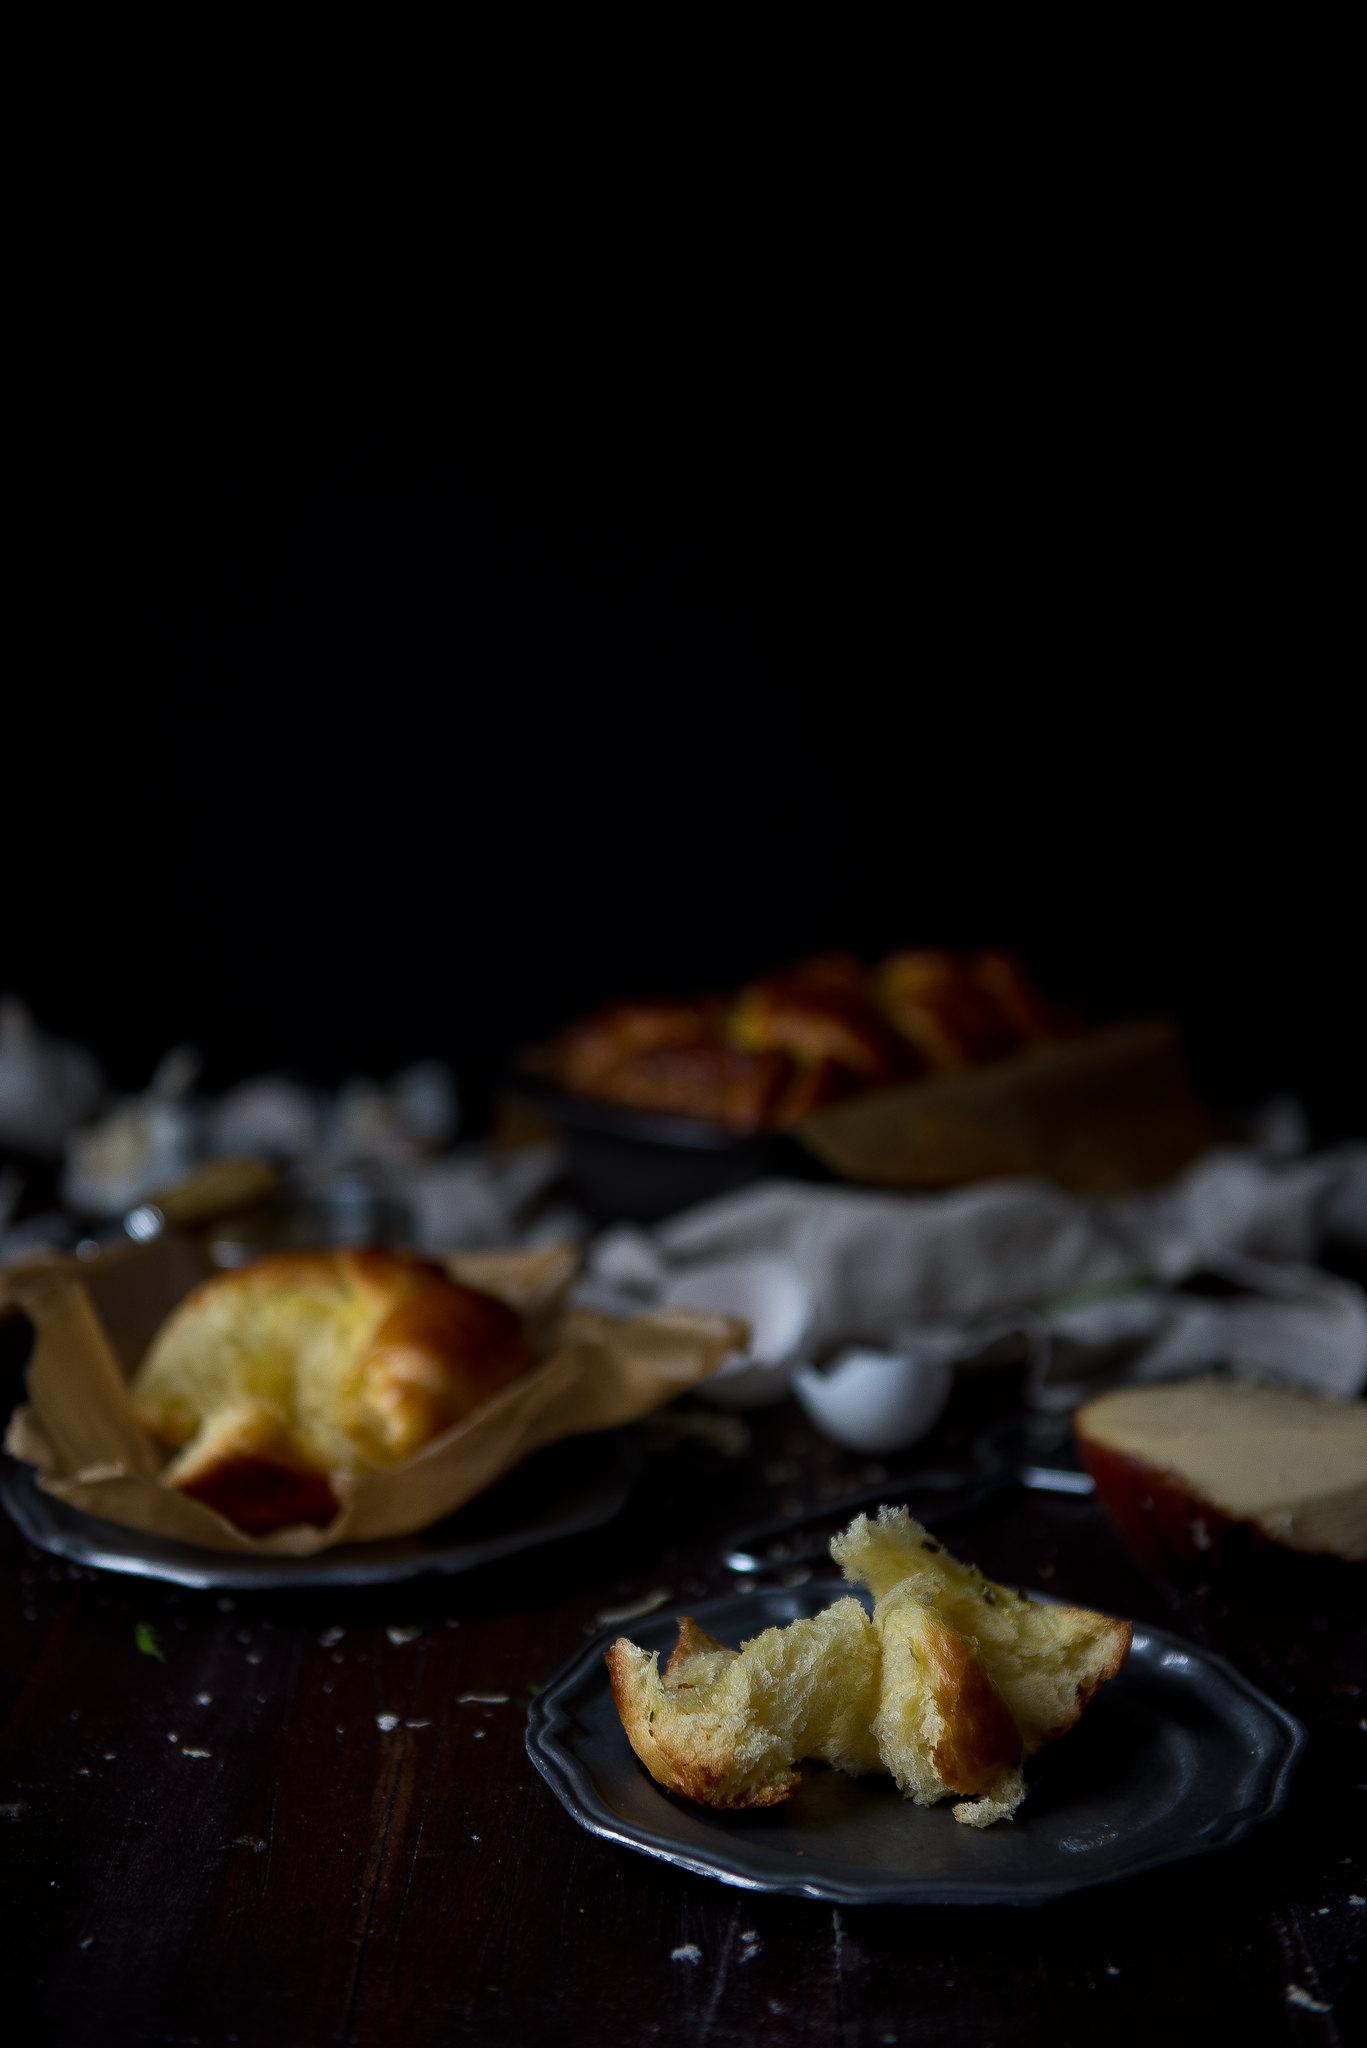 Garlic, chive & smoked gouda brioche.